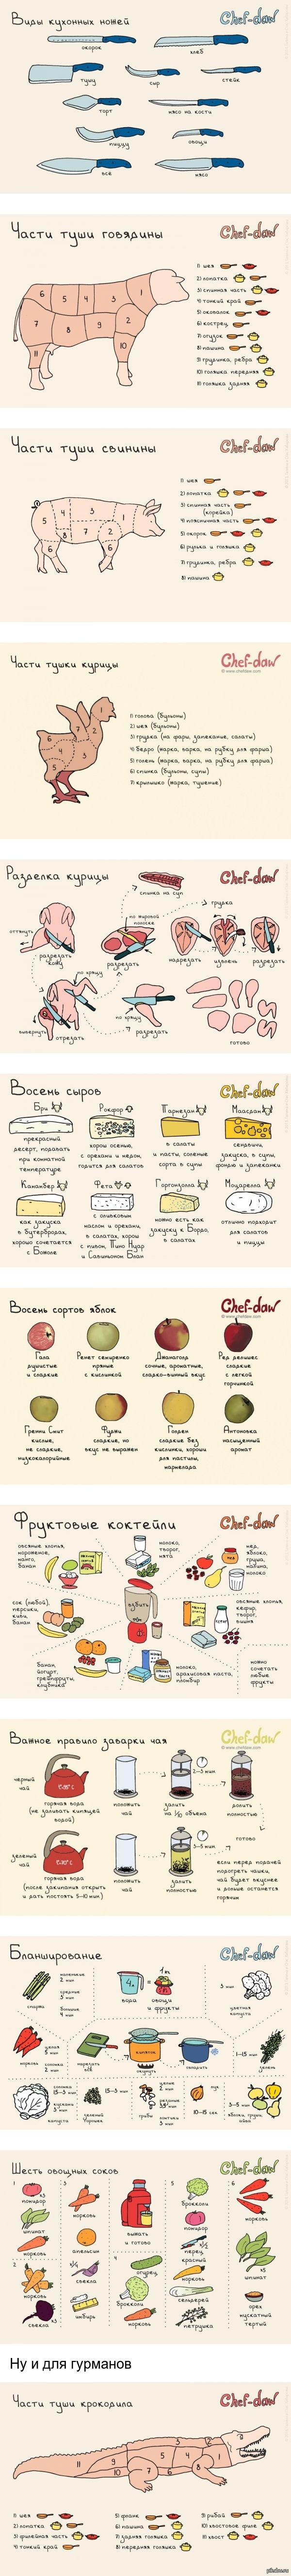 Шпаргалки для кухни Для любителей готовить